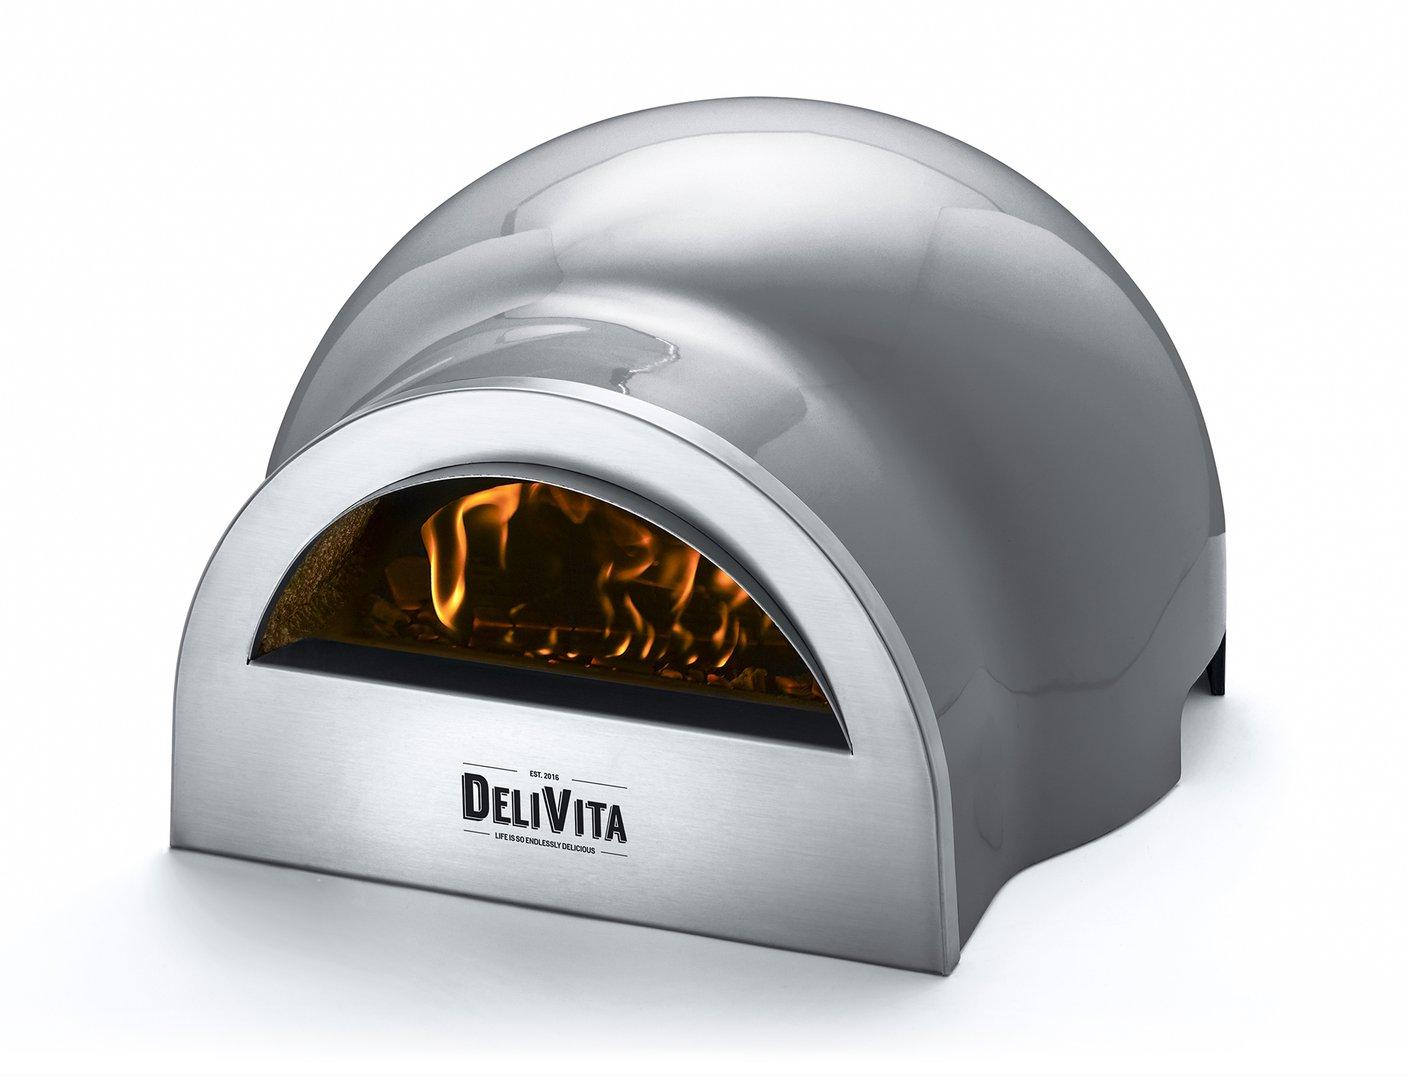 oven-hale-grey-side_1410x1076_crop_center.jpg